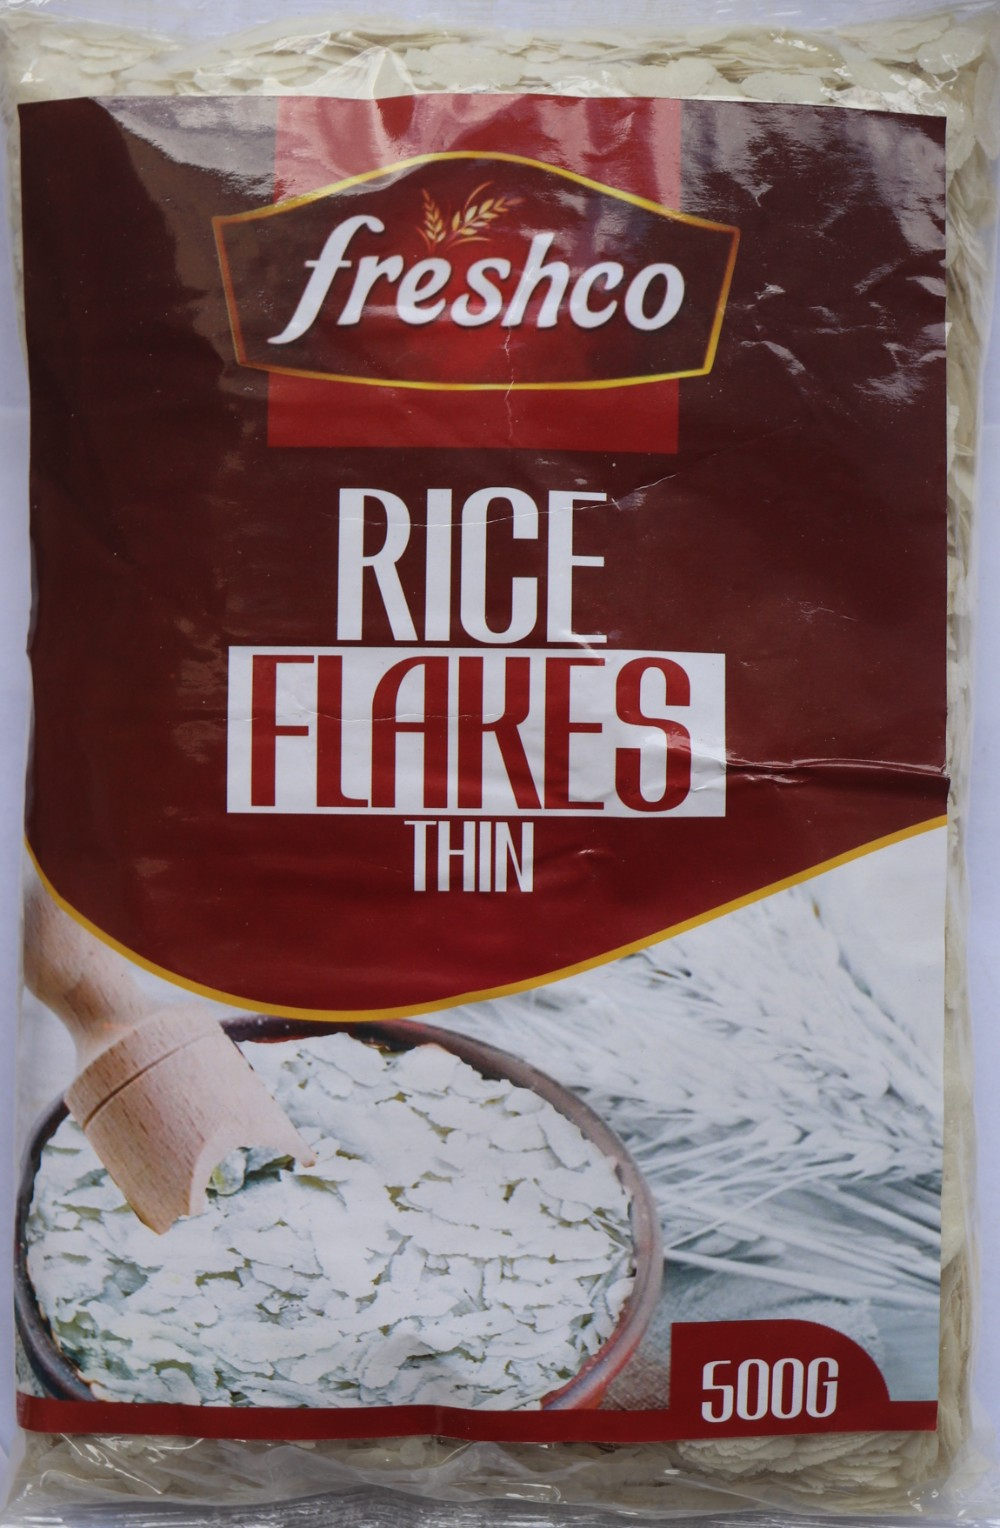 Freshco Rice Flakes Thin (Poha) 500g